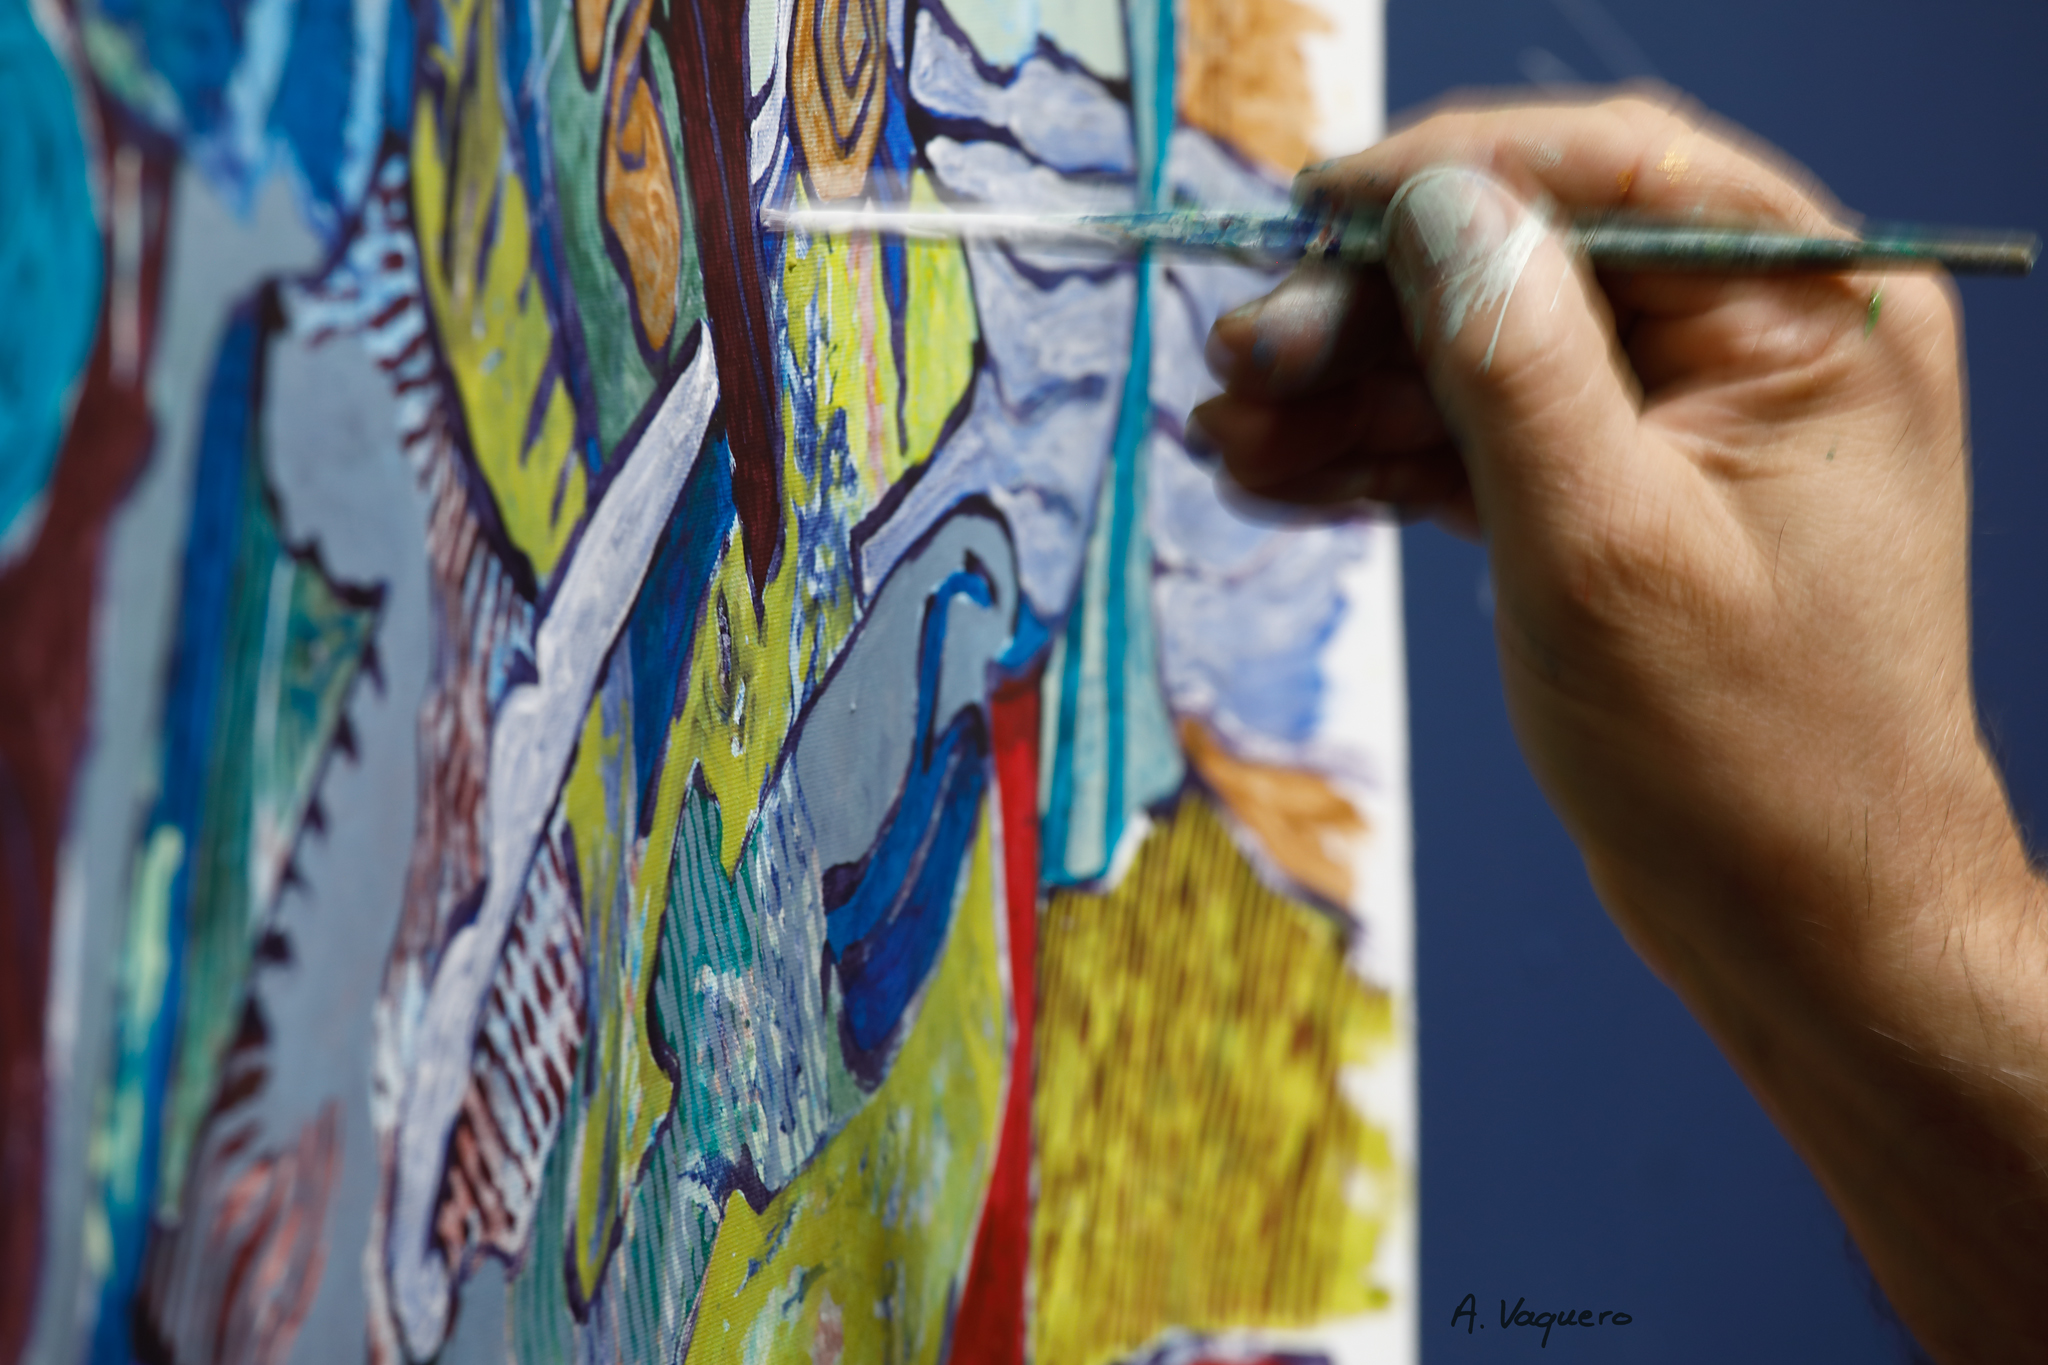 L'artiste Franck CAVADORE dans son atelier de Tarnos 1 © Alexandra VAQUERO